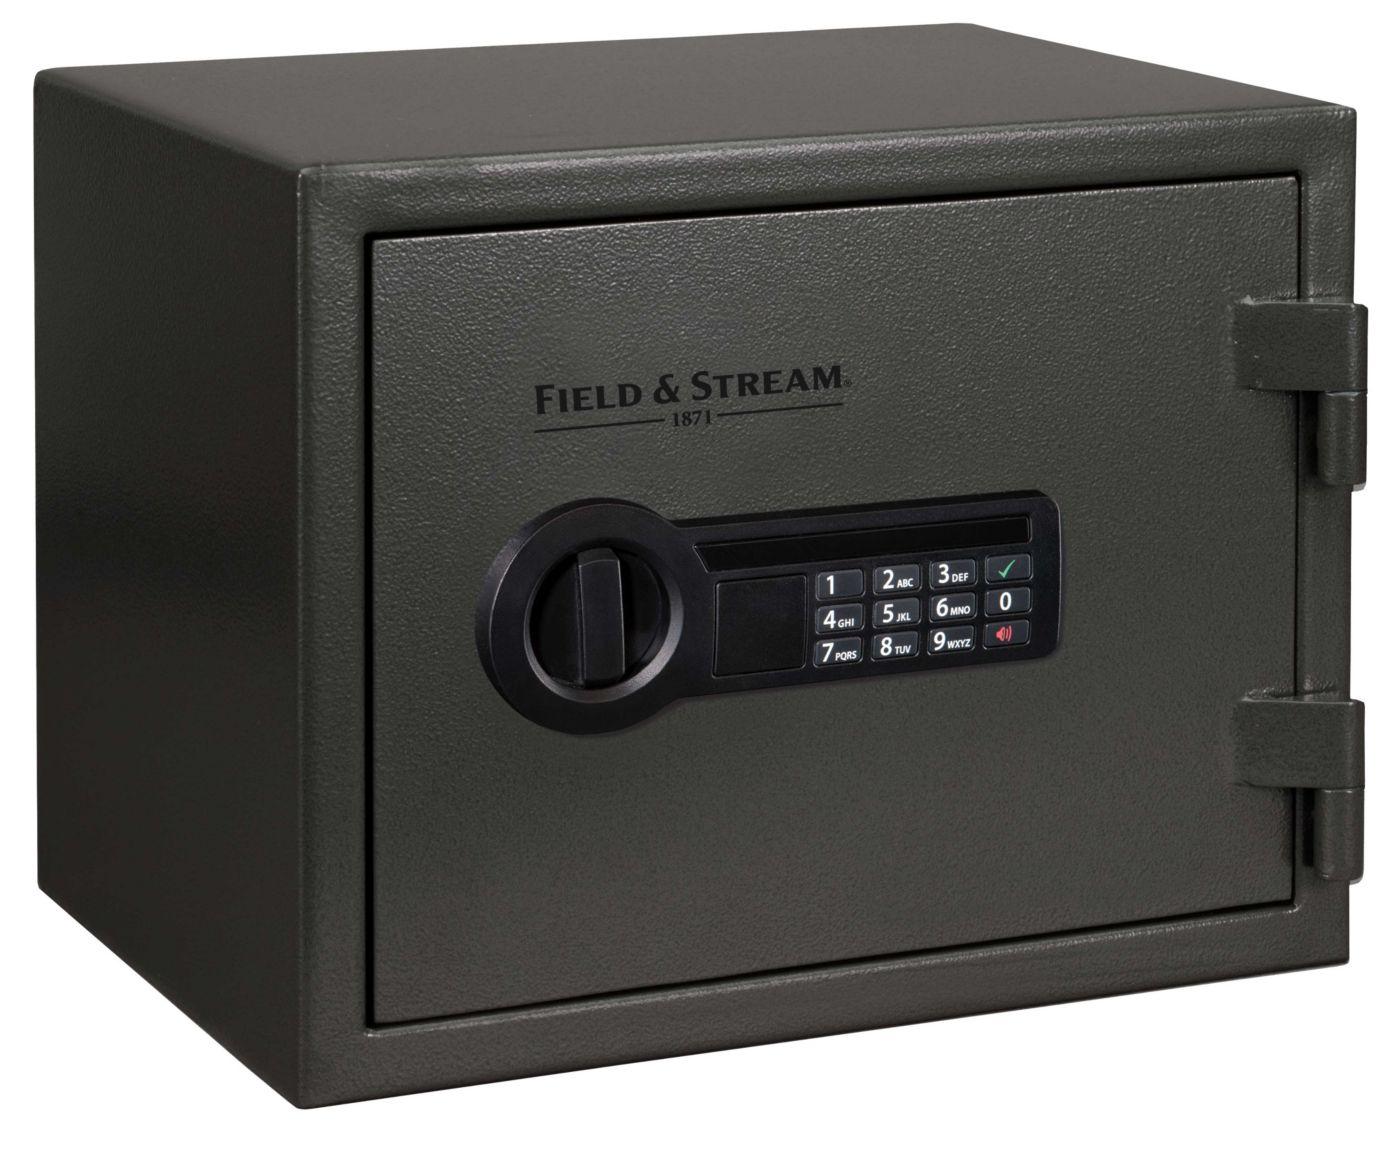 Field & Stream Personal Fire Safe – Small